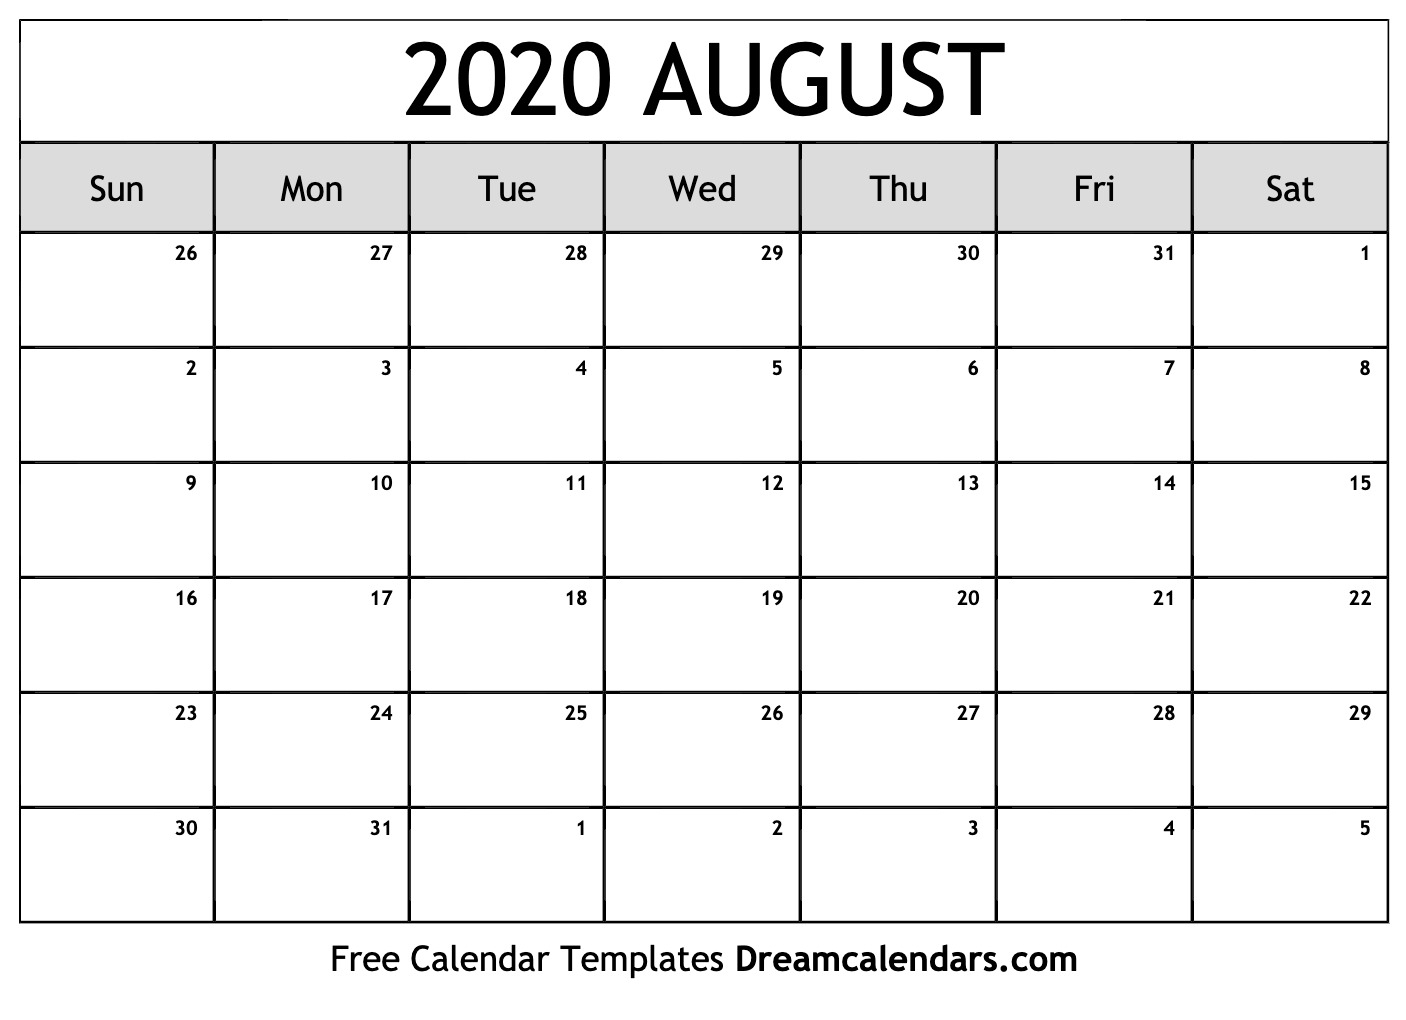 Printable August 2020 Calendar within June July August 2020 Calendar